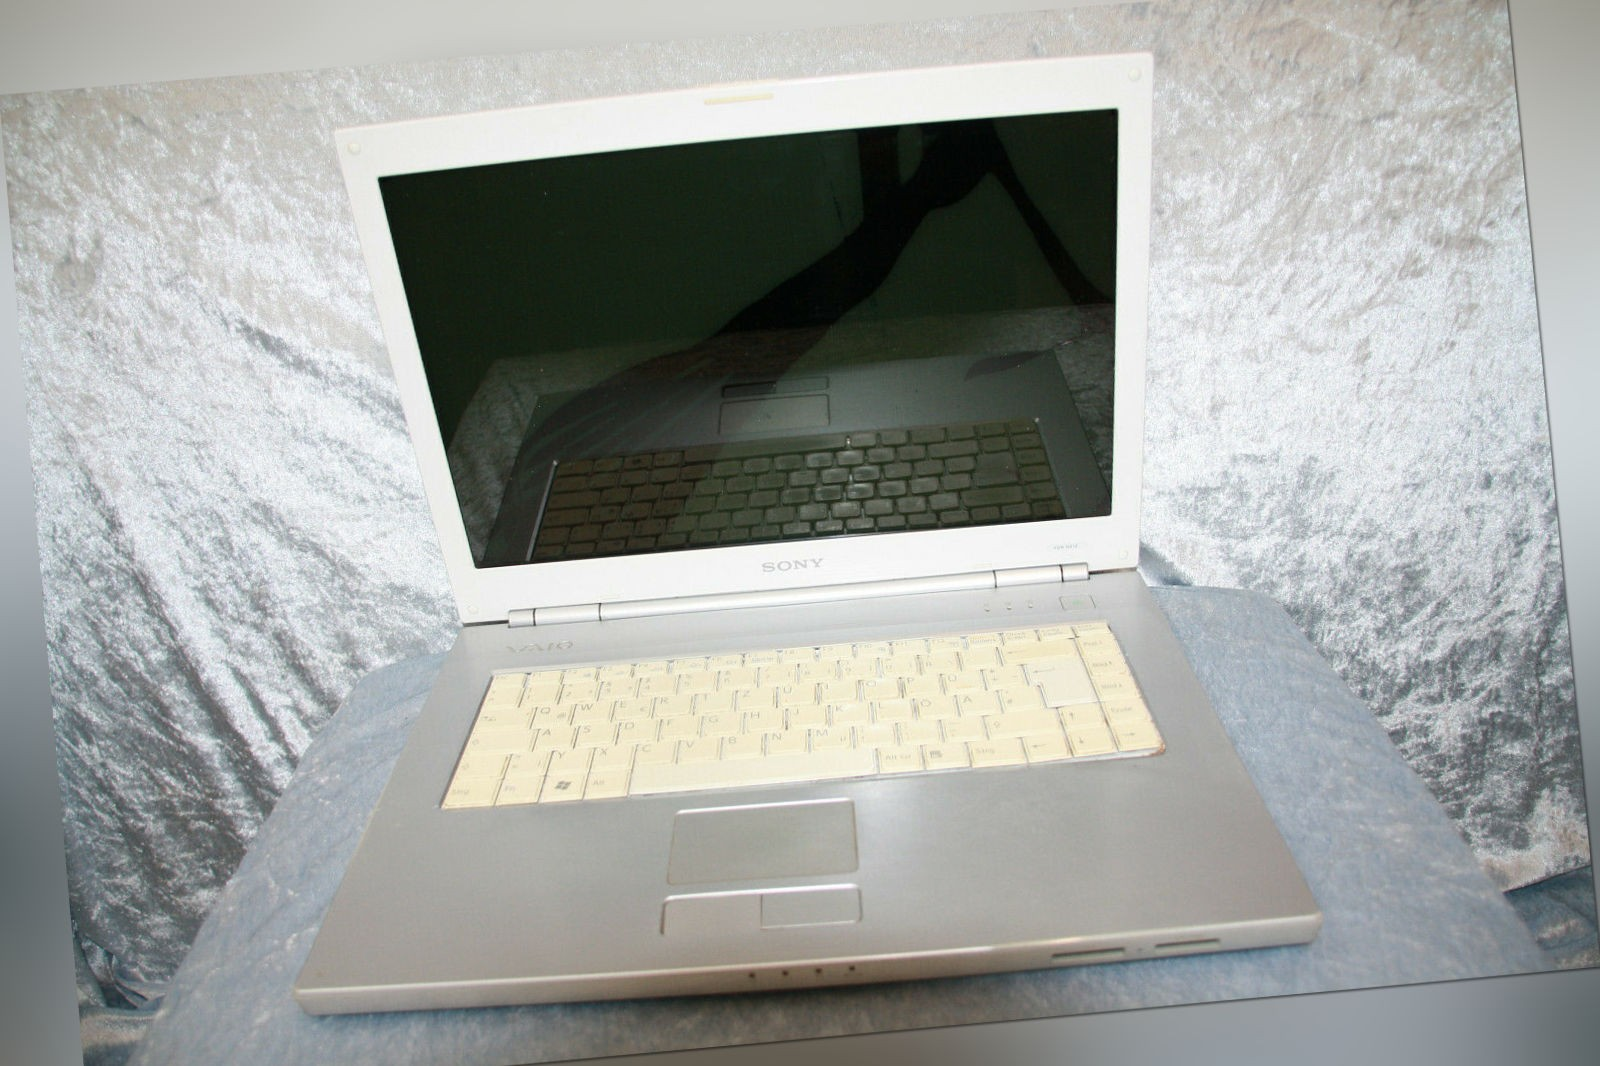 Sony VGN – N21Z PCG-7X1M Notebook Defekt/Bastler